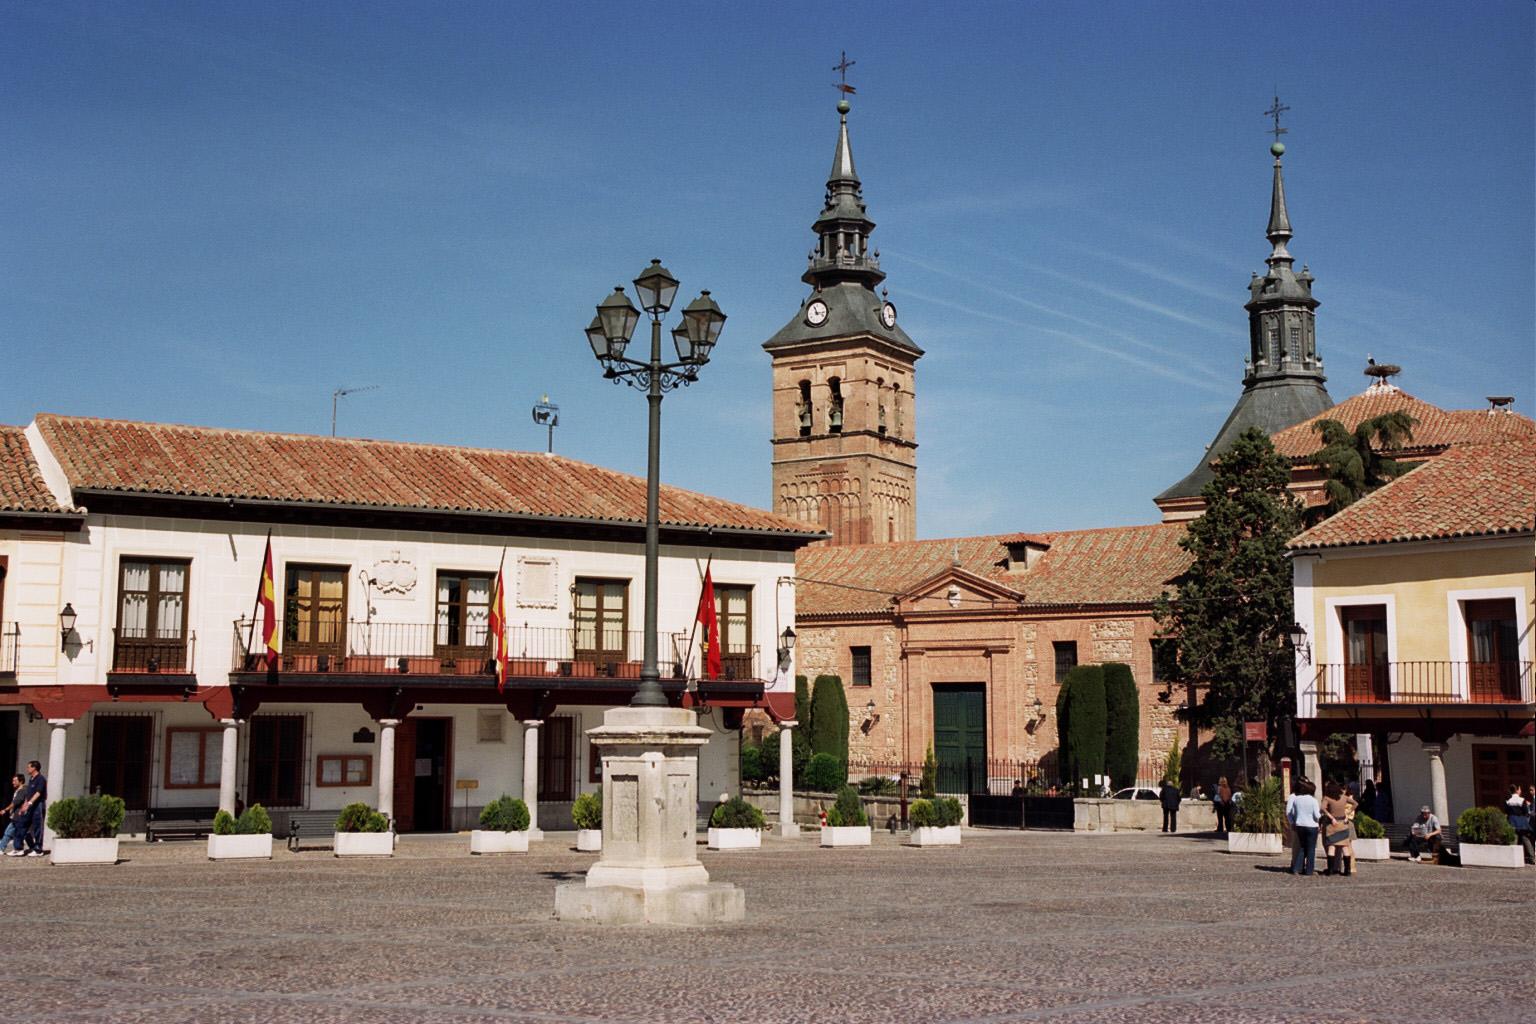 File:Plaza de Segovia de Navalcarnero.jpg - Wikimedia Commons